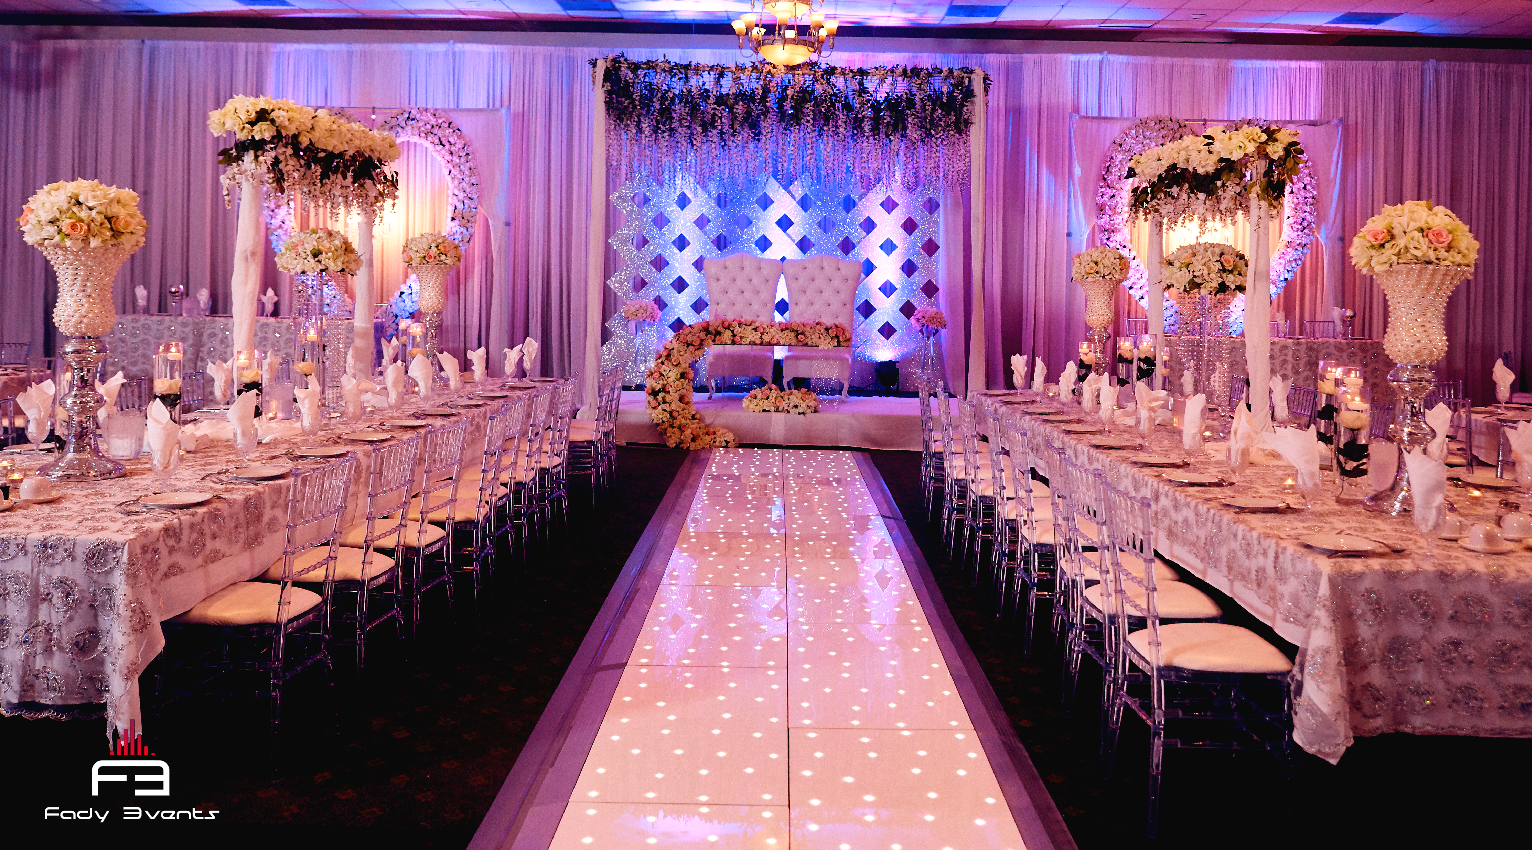 san-diego-fady-events-wedding-uplighting-rental